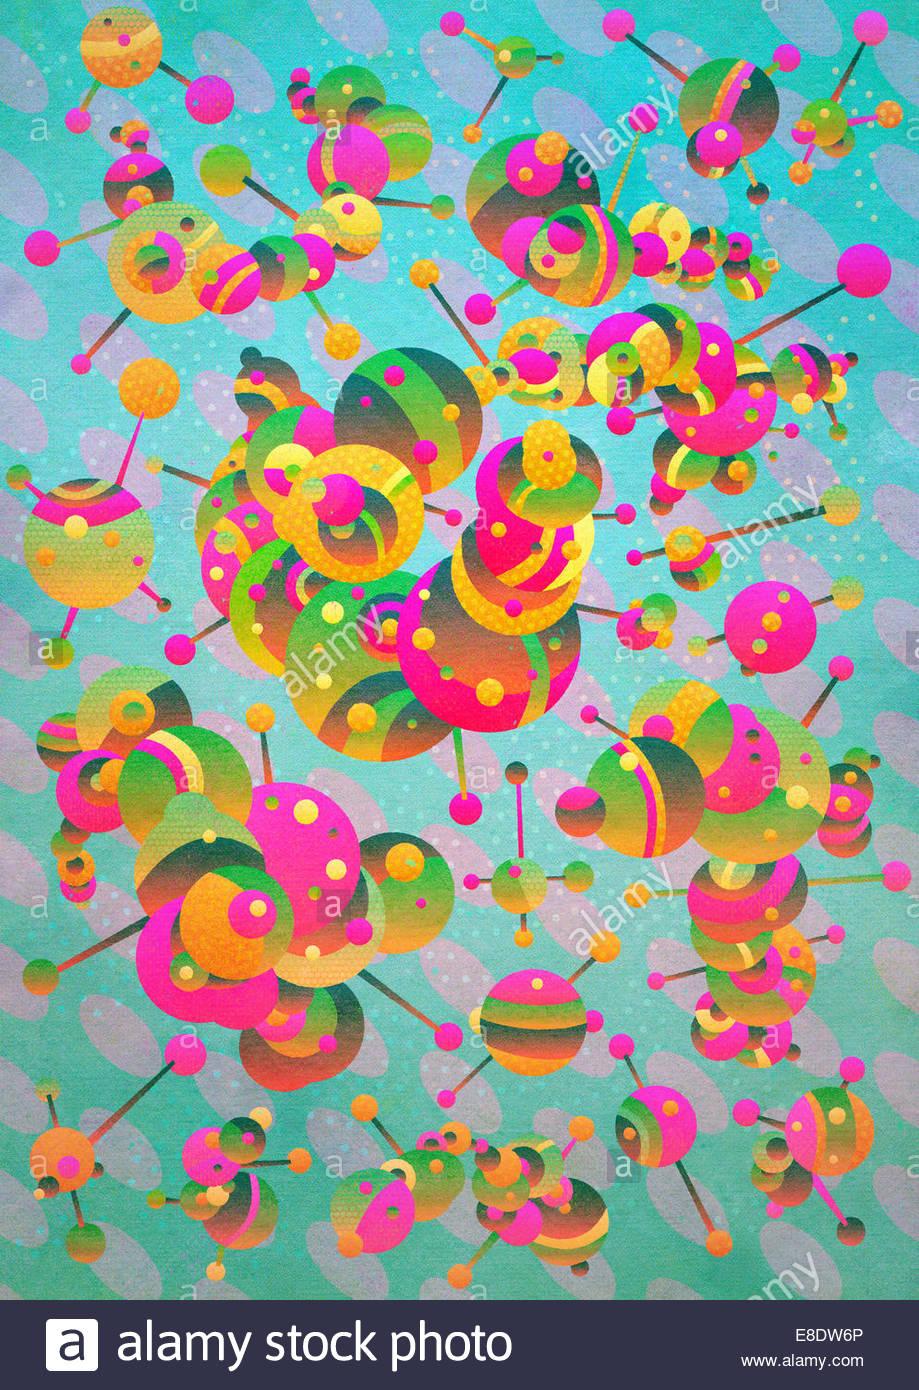 Abstract moléculas conectado Imagen De Stock